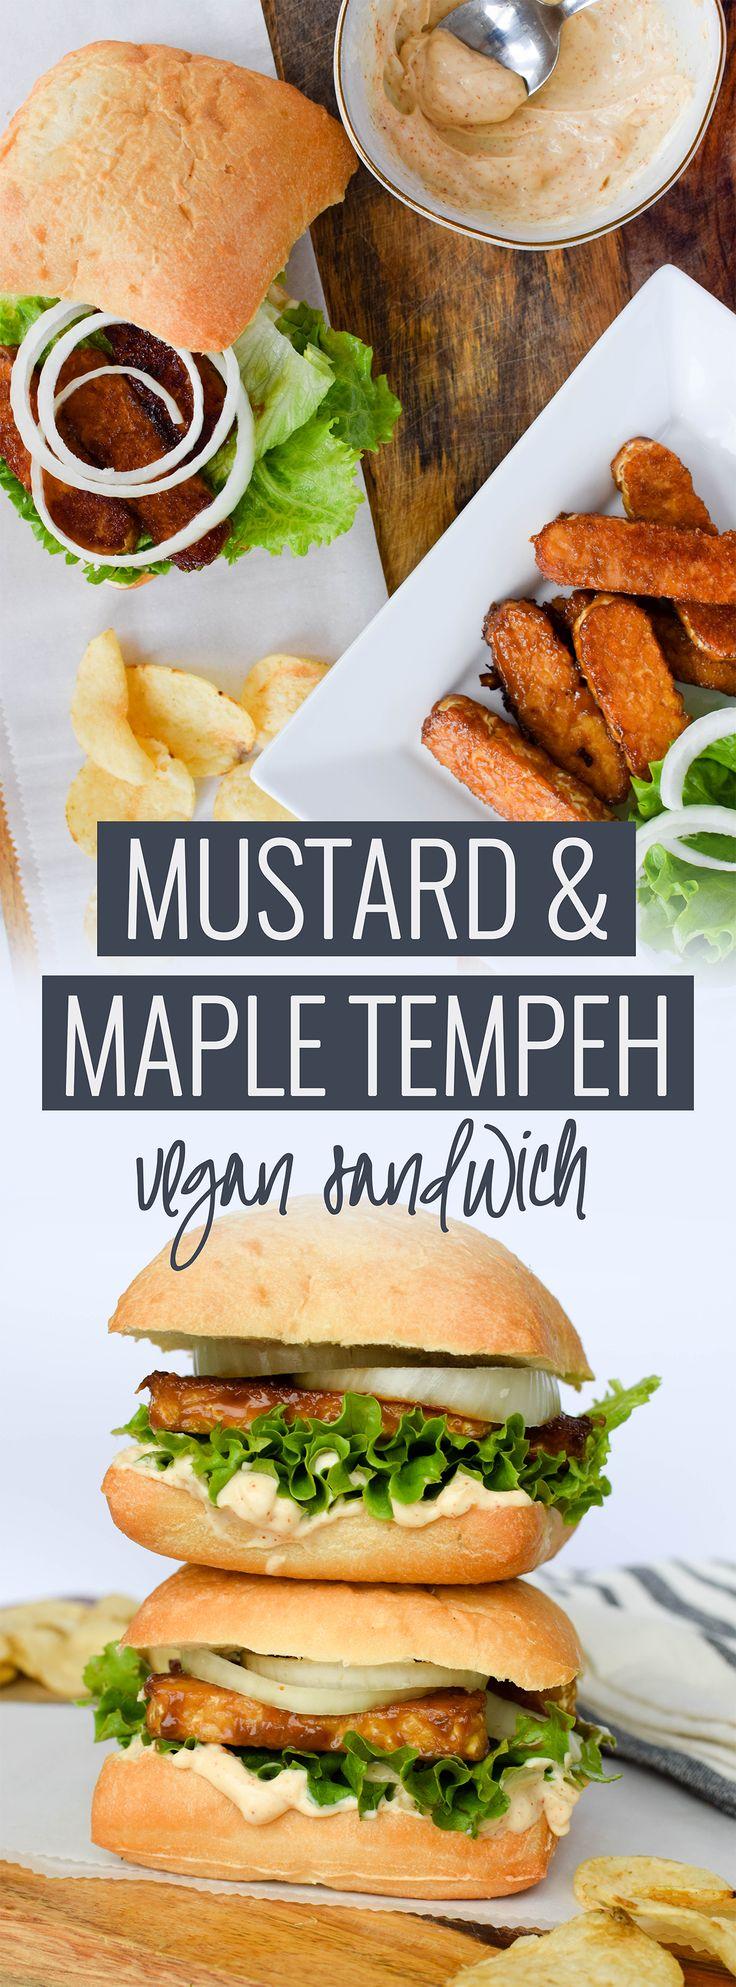 Mustard Maple Tempeh Sandwich // Vegan Sandwich // Vegan Lunch // Easy Vegan Lunch // Healthy Vegan Lunch // Healthy Vegan // Healthy Vegan Recipes // Easy Vegan Recipes //